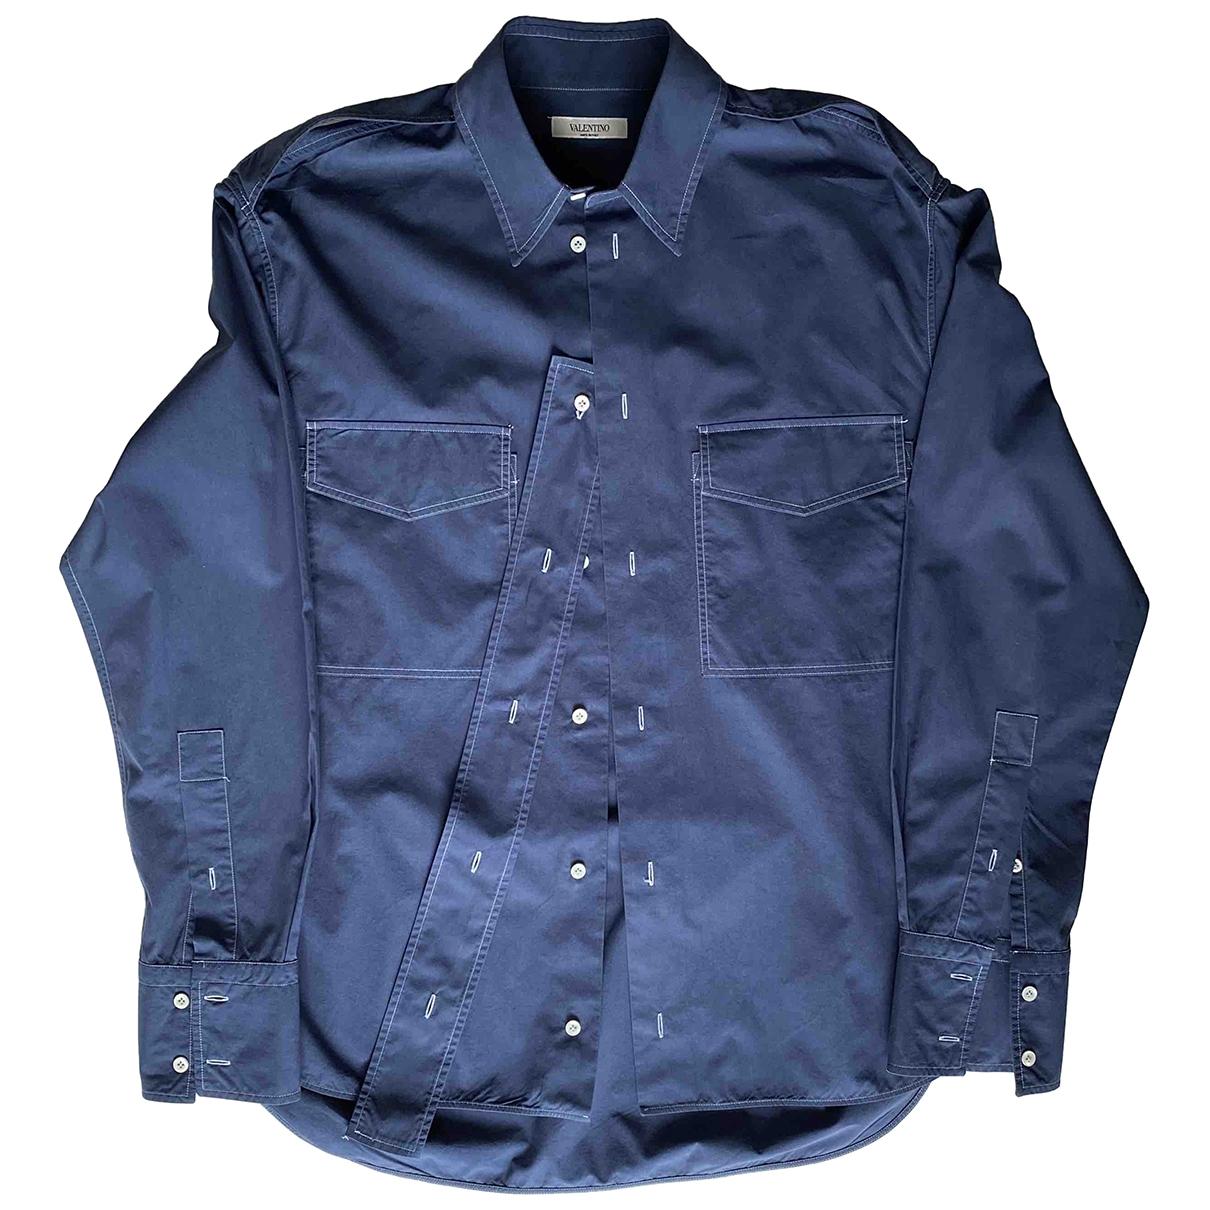 Valentino Garavani \N Navy Cotton Shirts for Men 38 EU (tour de cou / collar)